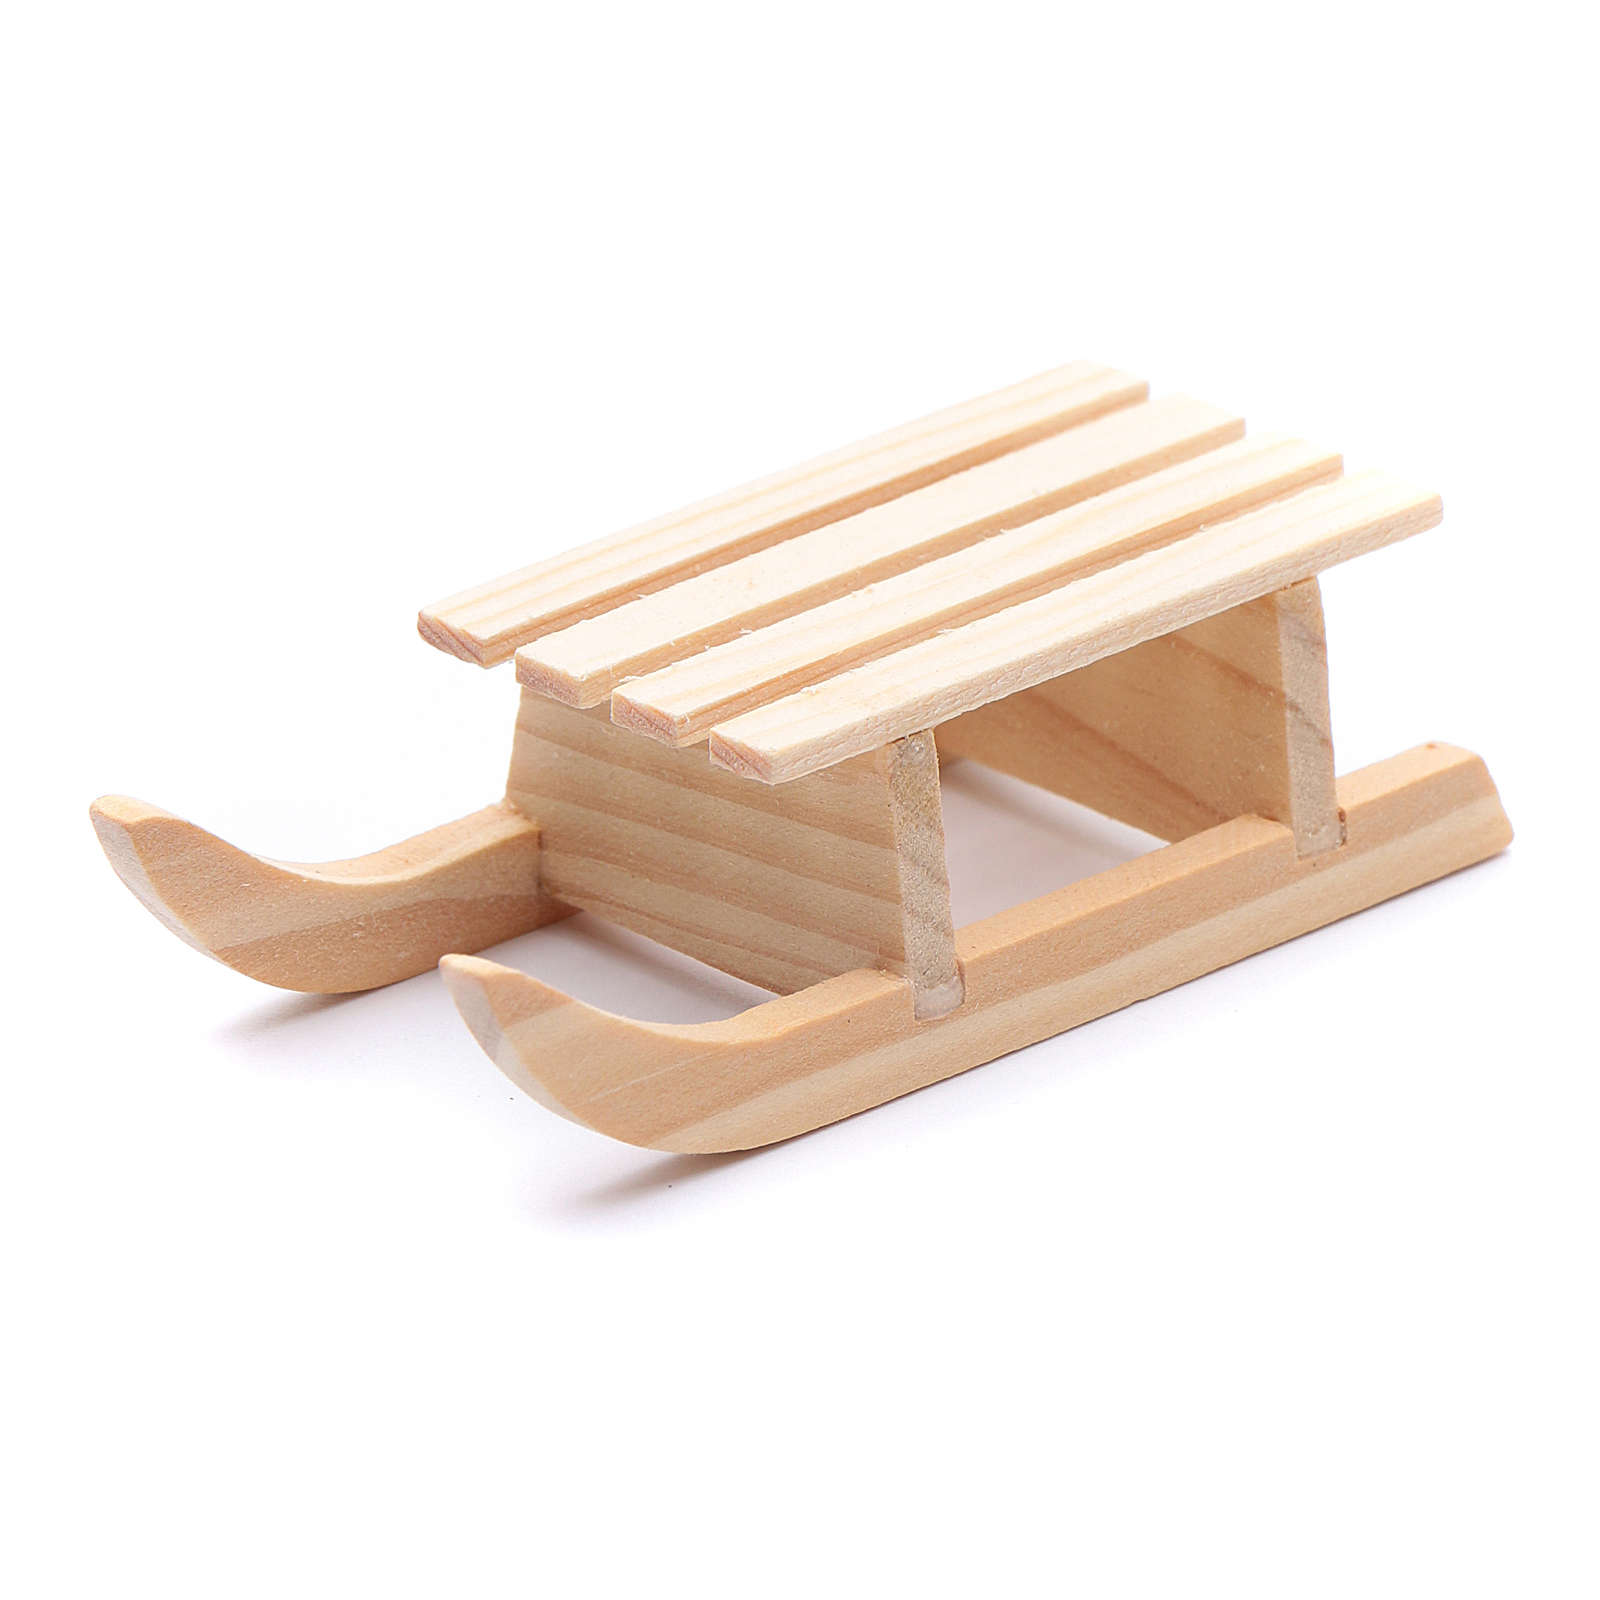 Slitta legno 2x8x3 cm per presepe 4